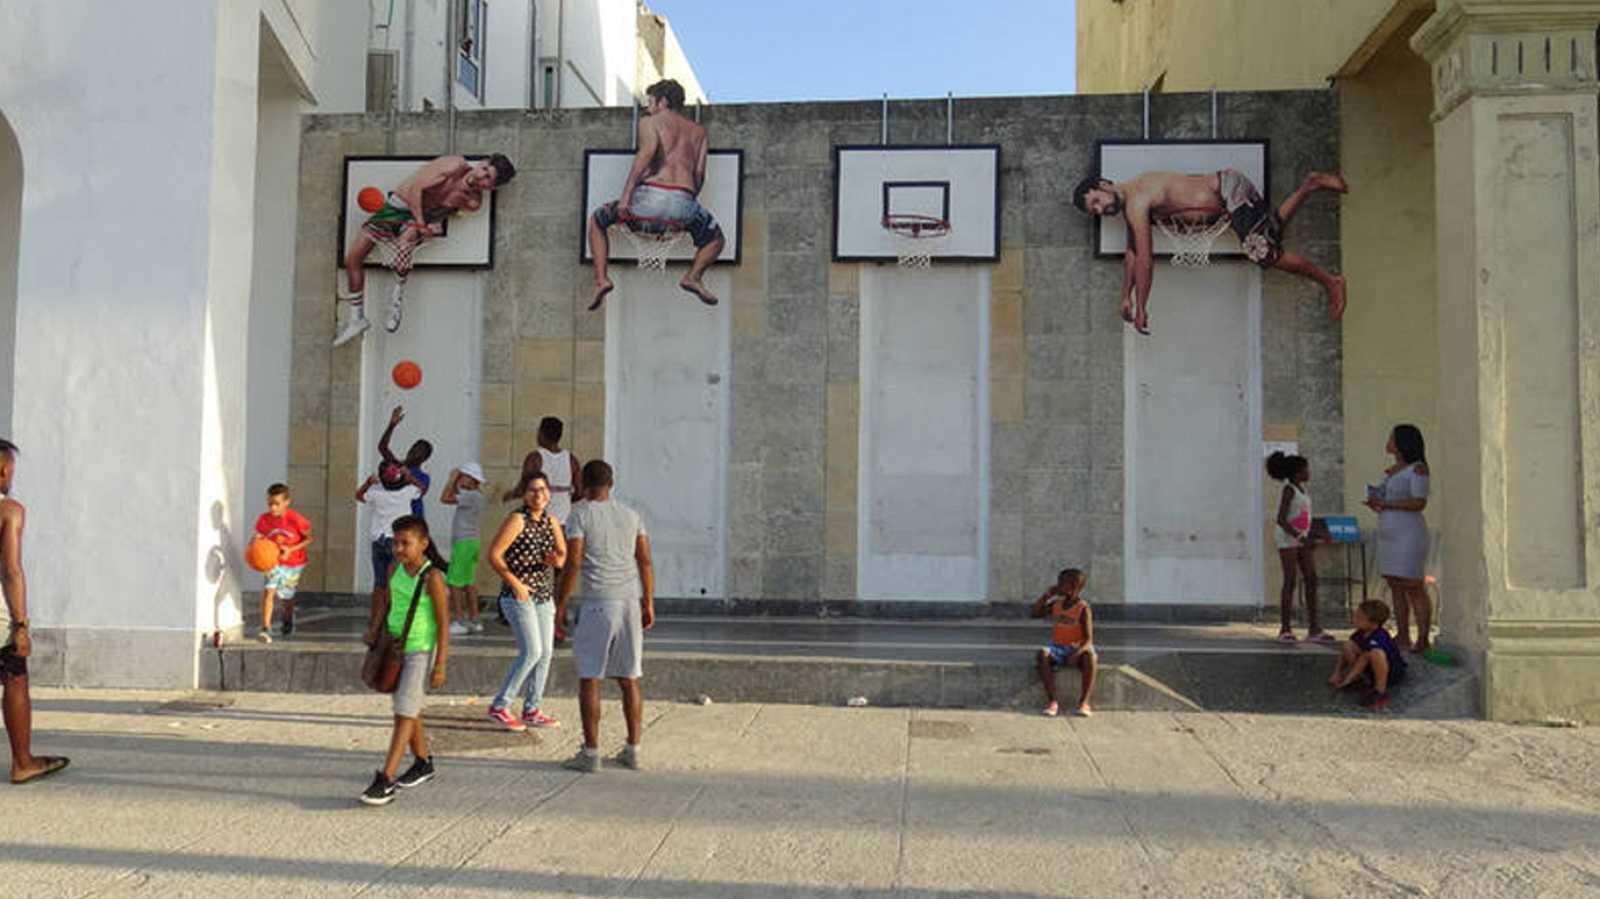 Metrópolis - Bienal de la Habana 2019 (I) - ver ahora